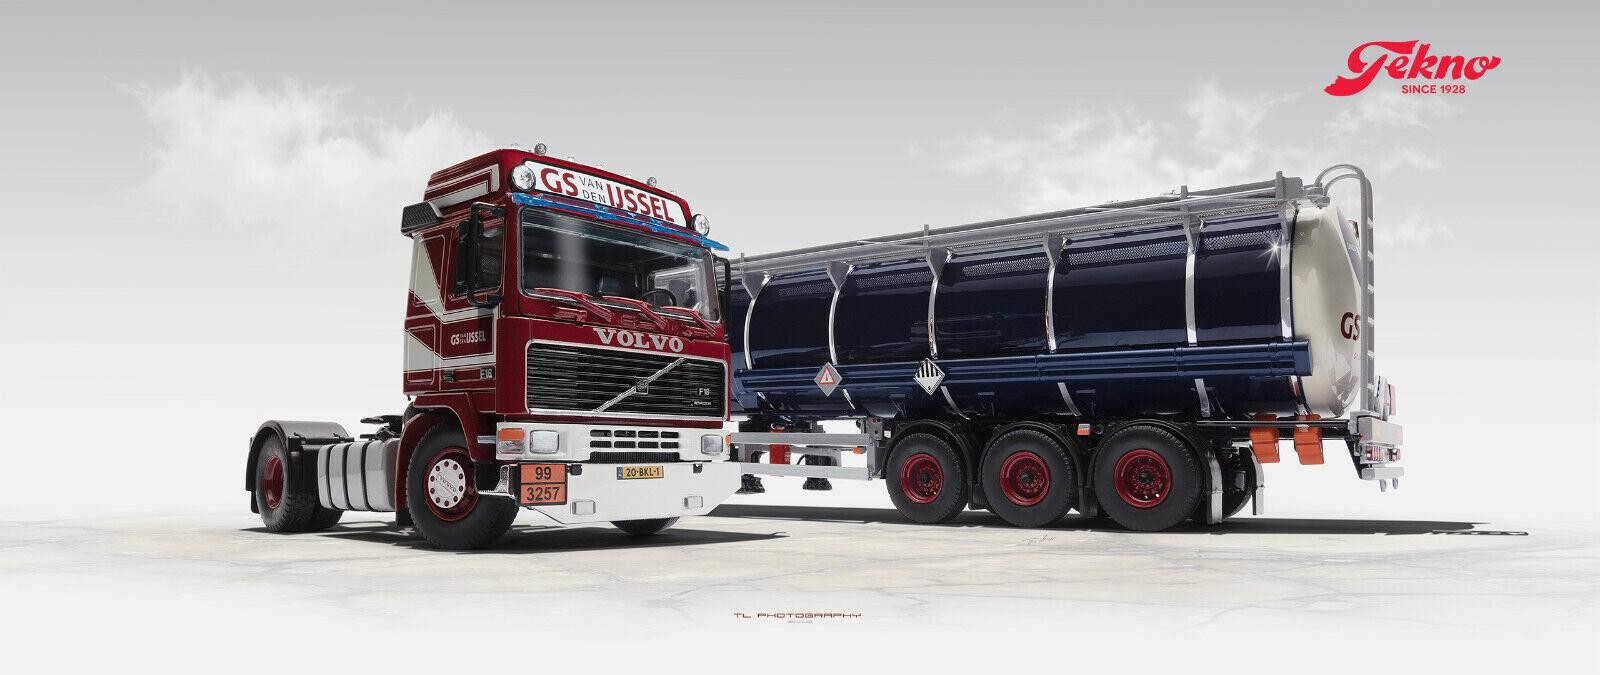 garantía de crédito Tekno 74171 IJssel, IJssel, IJssel, van den volvo f16  oferta especial